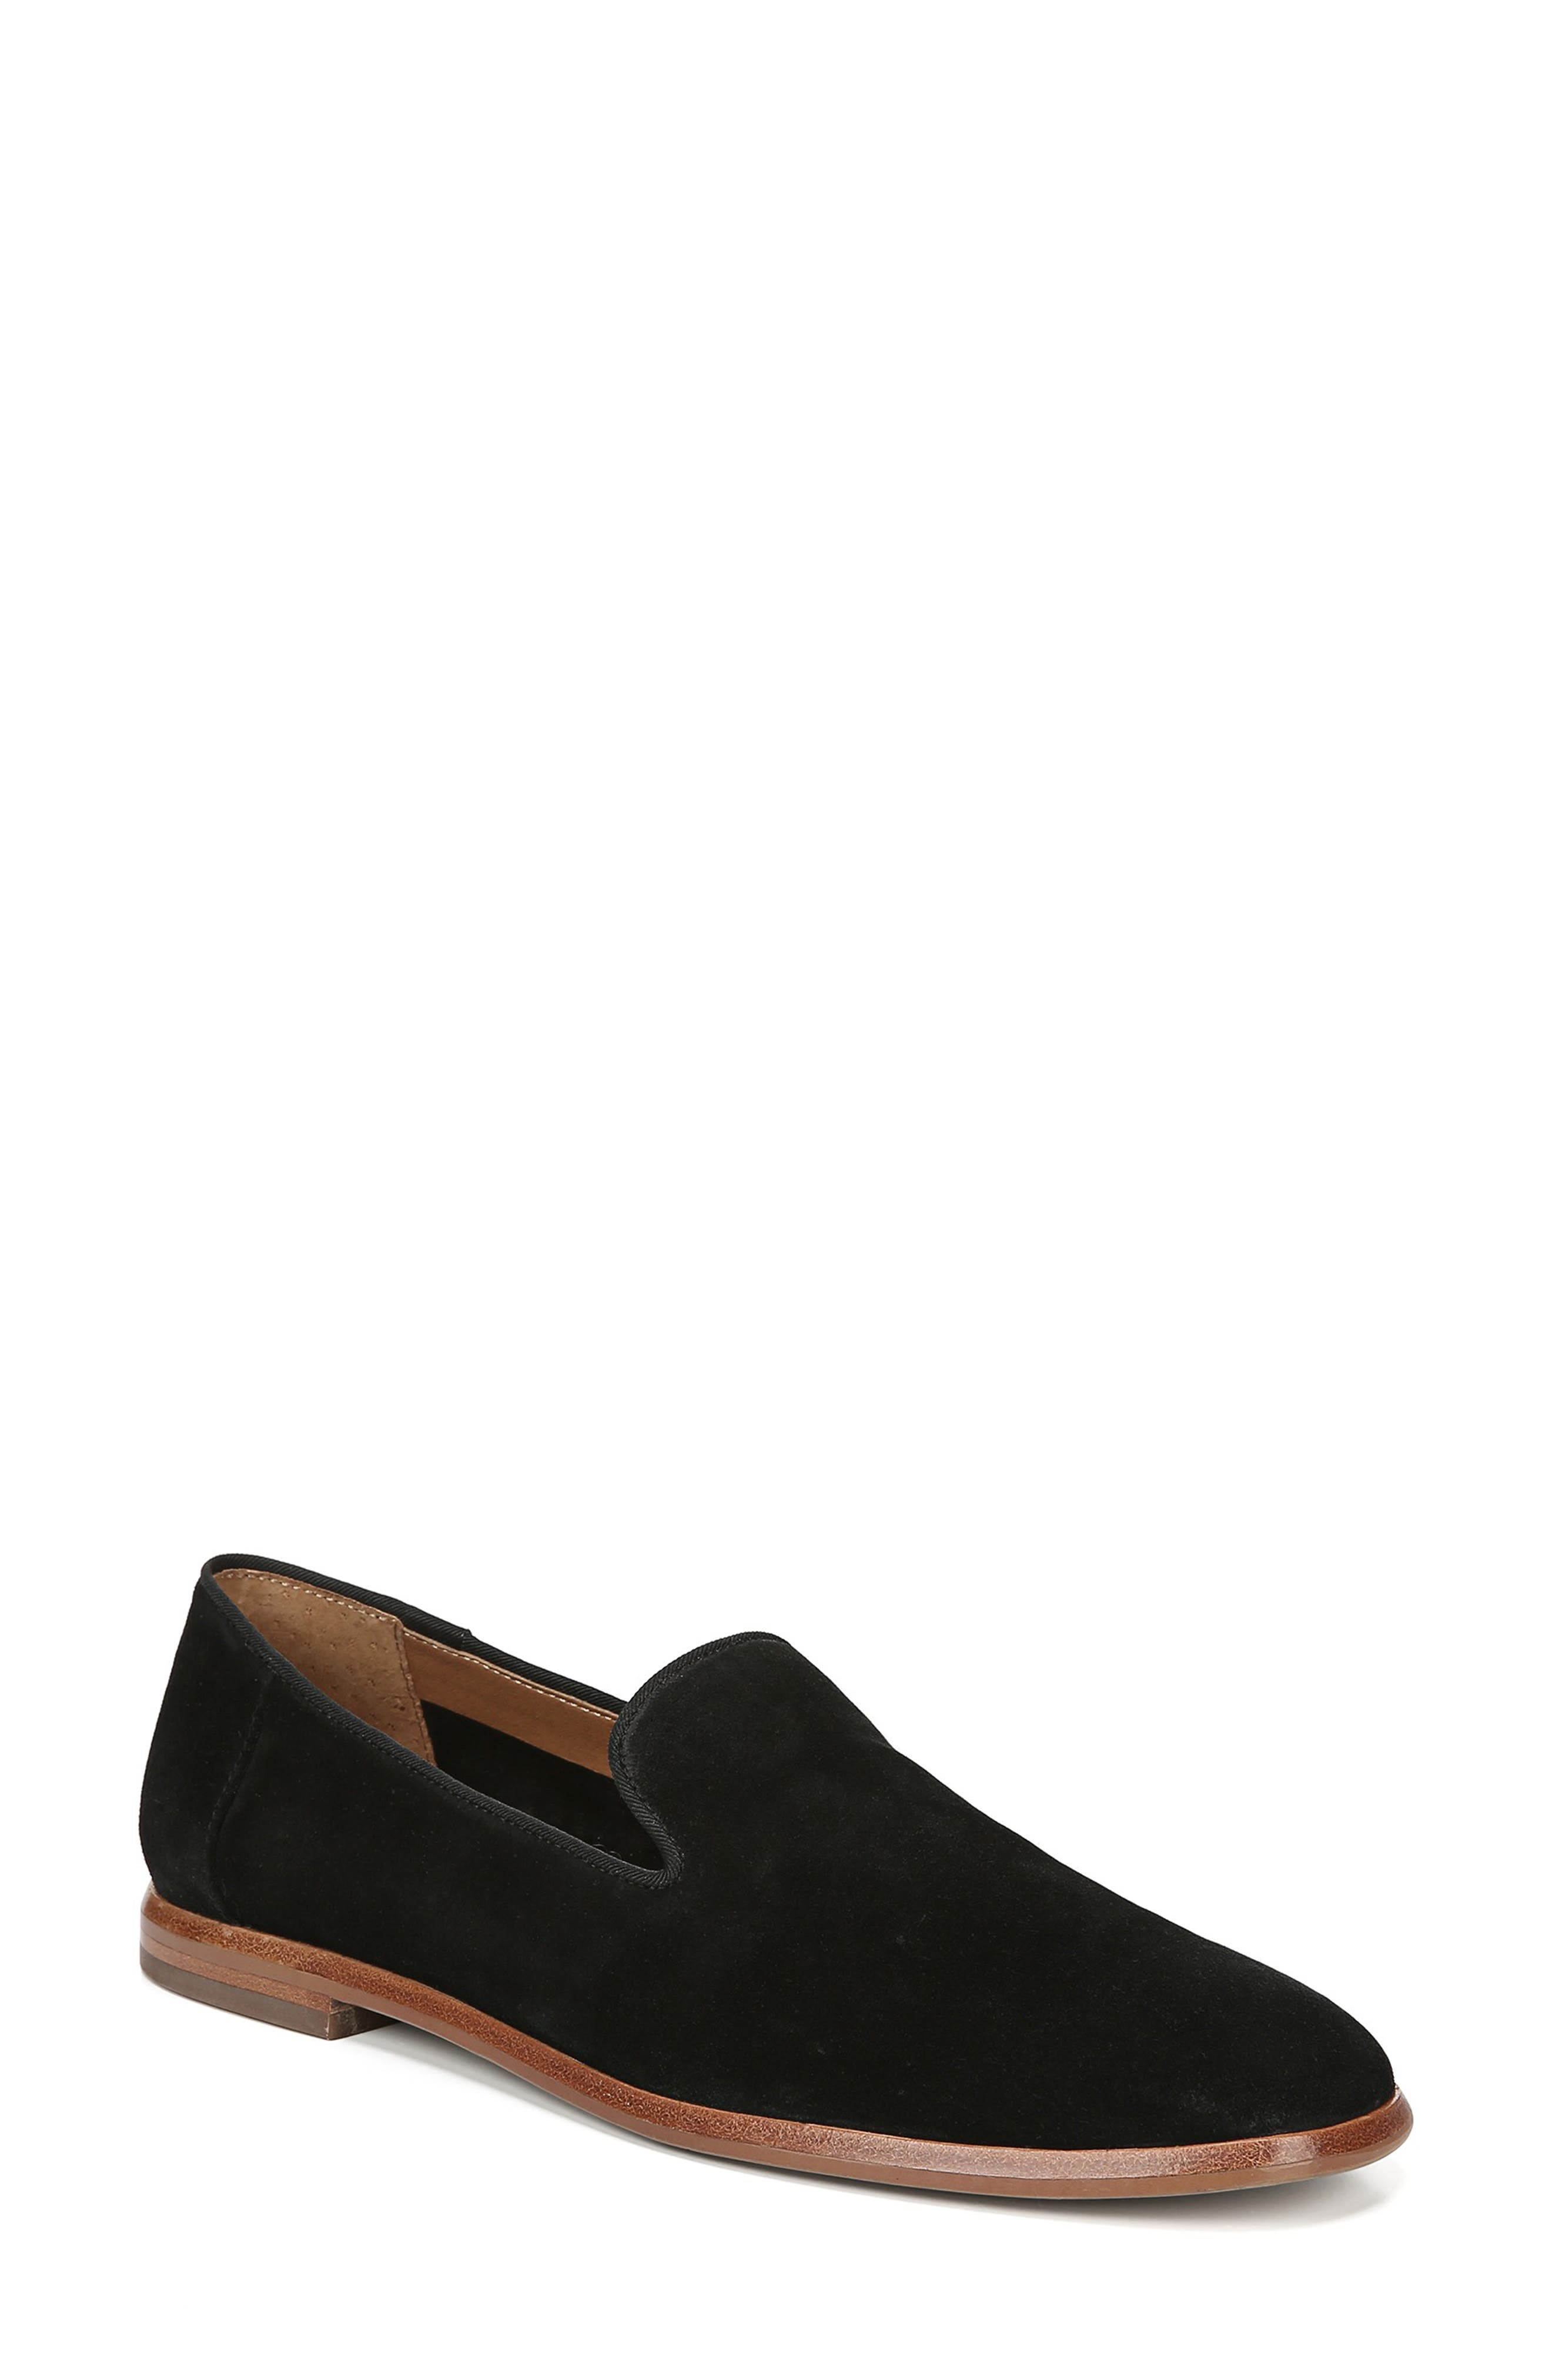 Fallon Loafer, Main, color, BLACK SUEDE